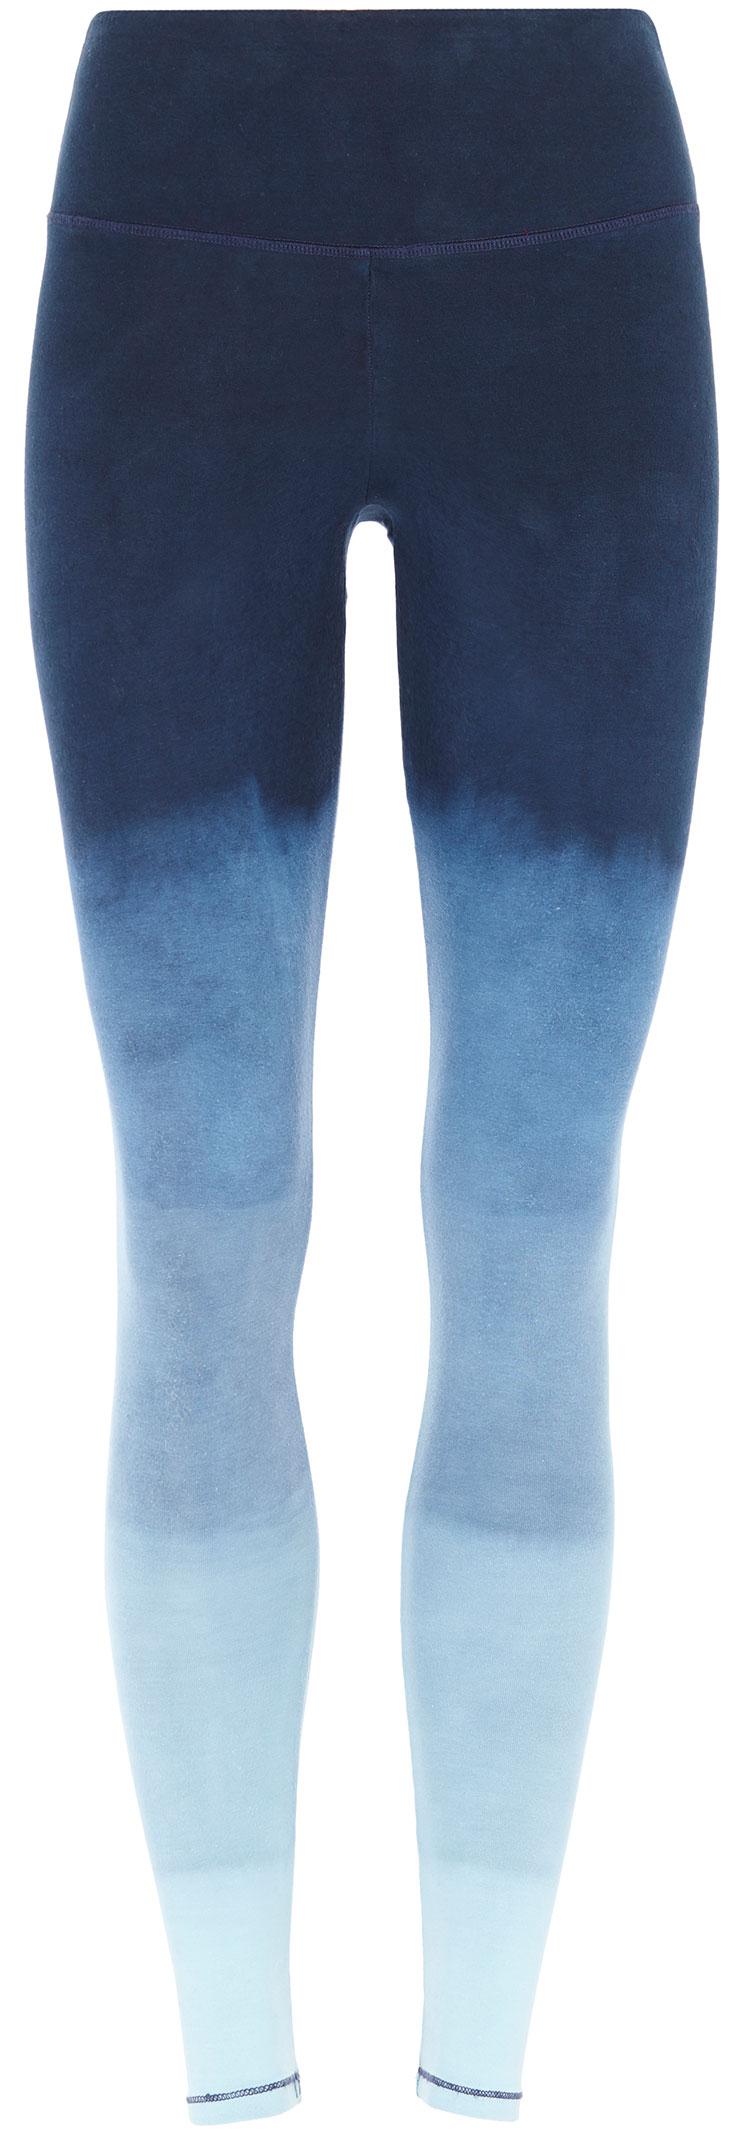 Peppermynta-Peppermint-Eco-Lifestyle-Mangolds-Online-Shop-Outstanding-Lifestyle-mandala-blue-night-Yoga-Leggings-Yogawear